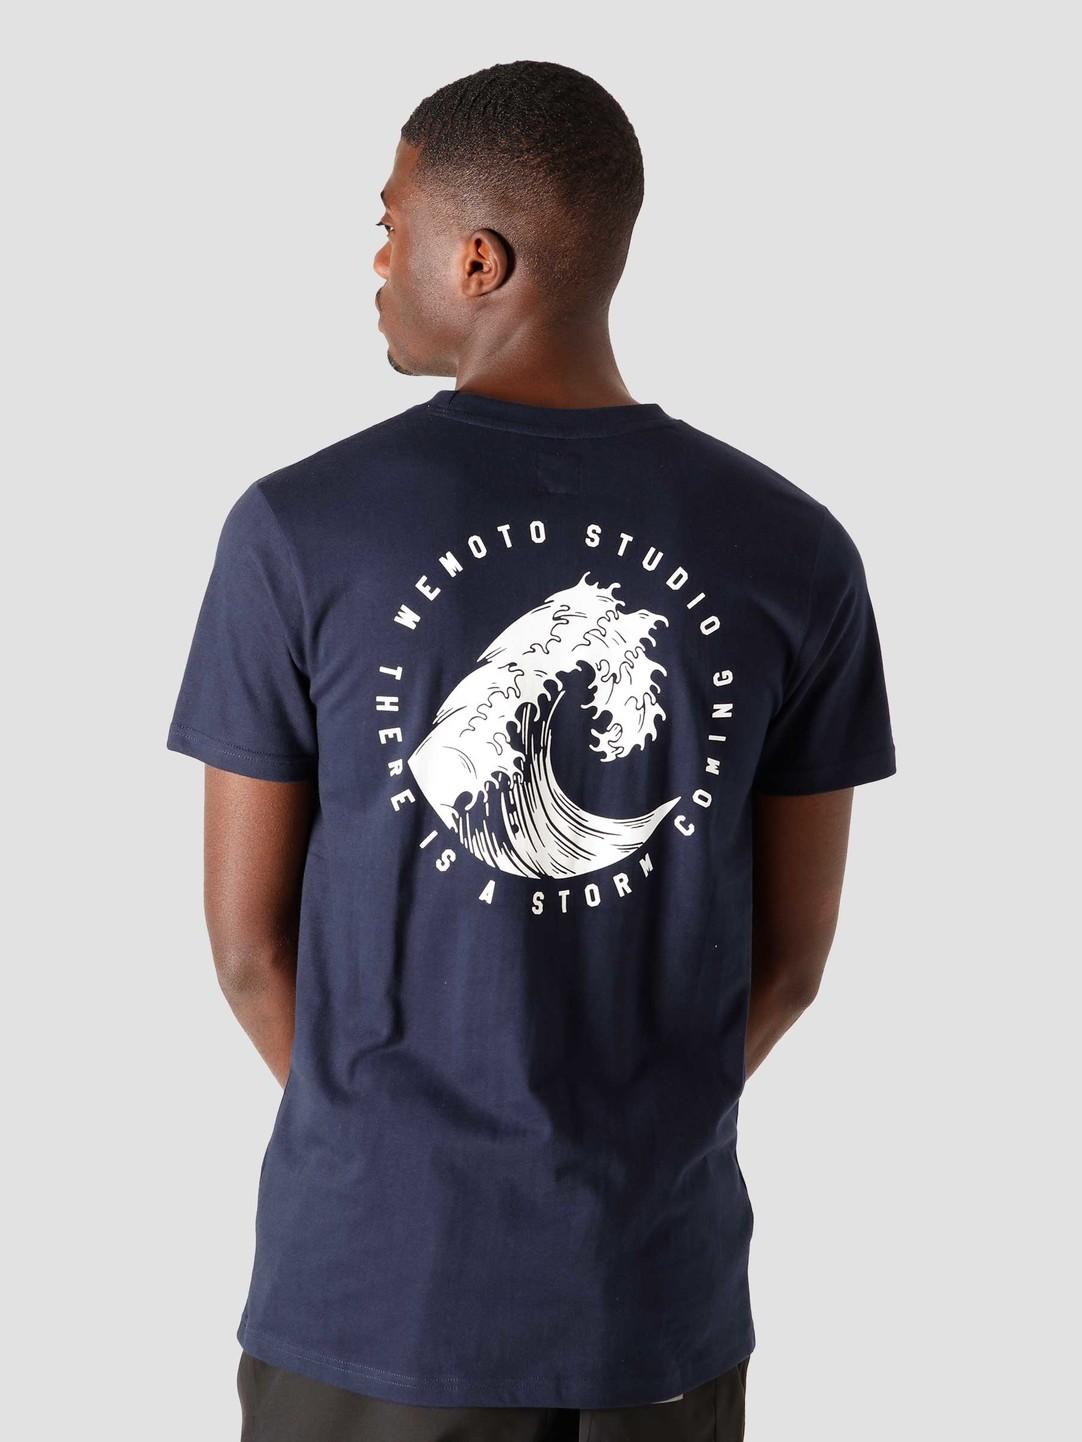 Wemoto Wemoto Wave T-Shirt Navy Blue 161.142-400